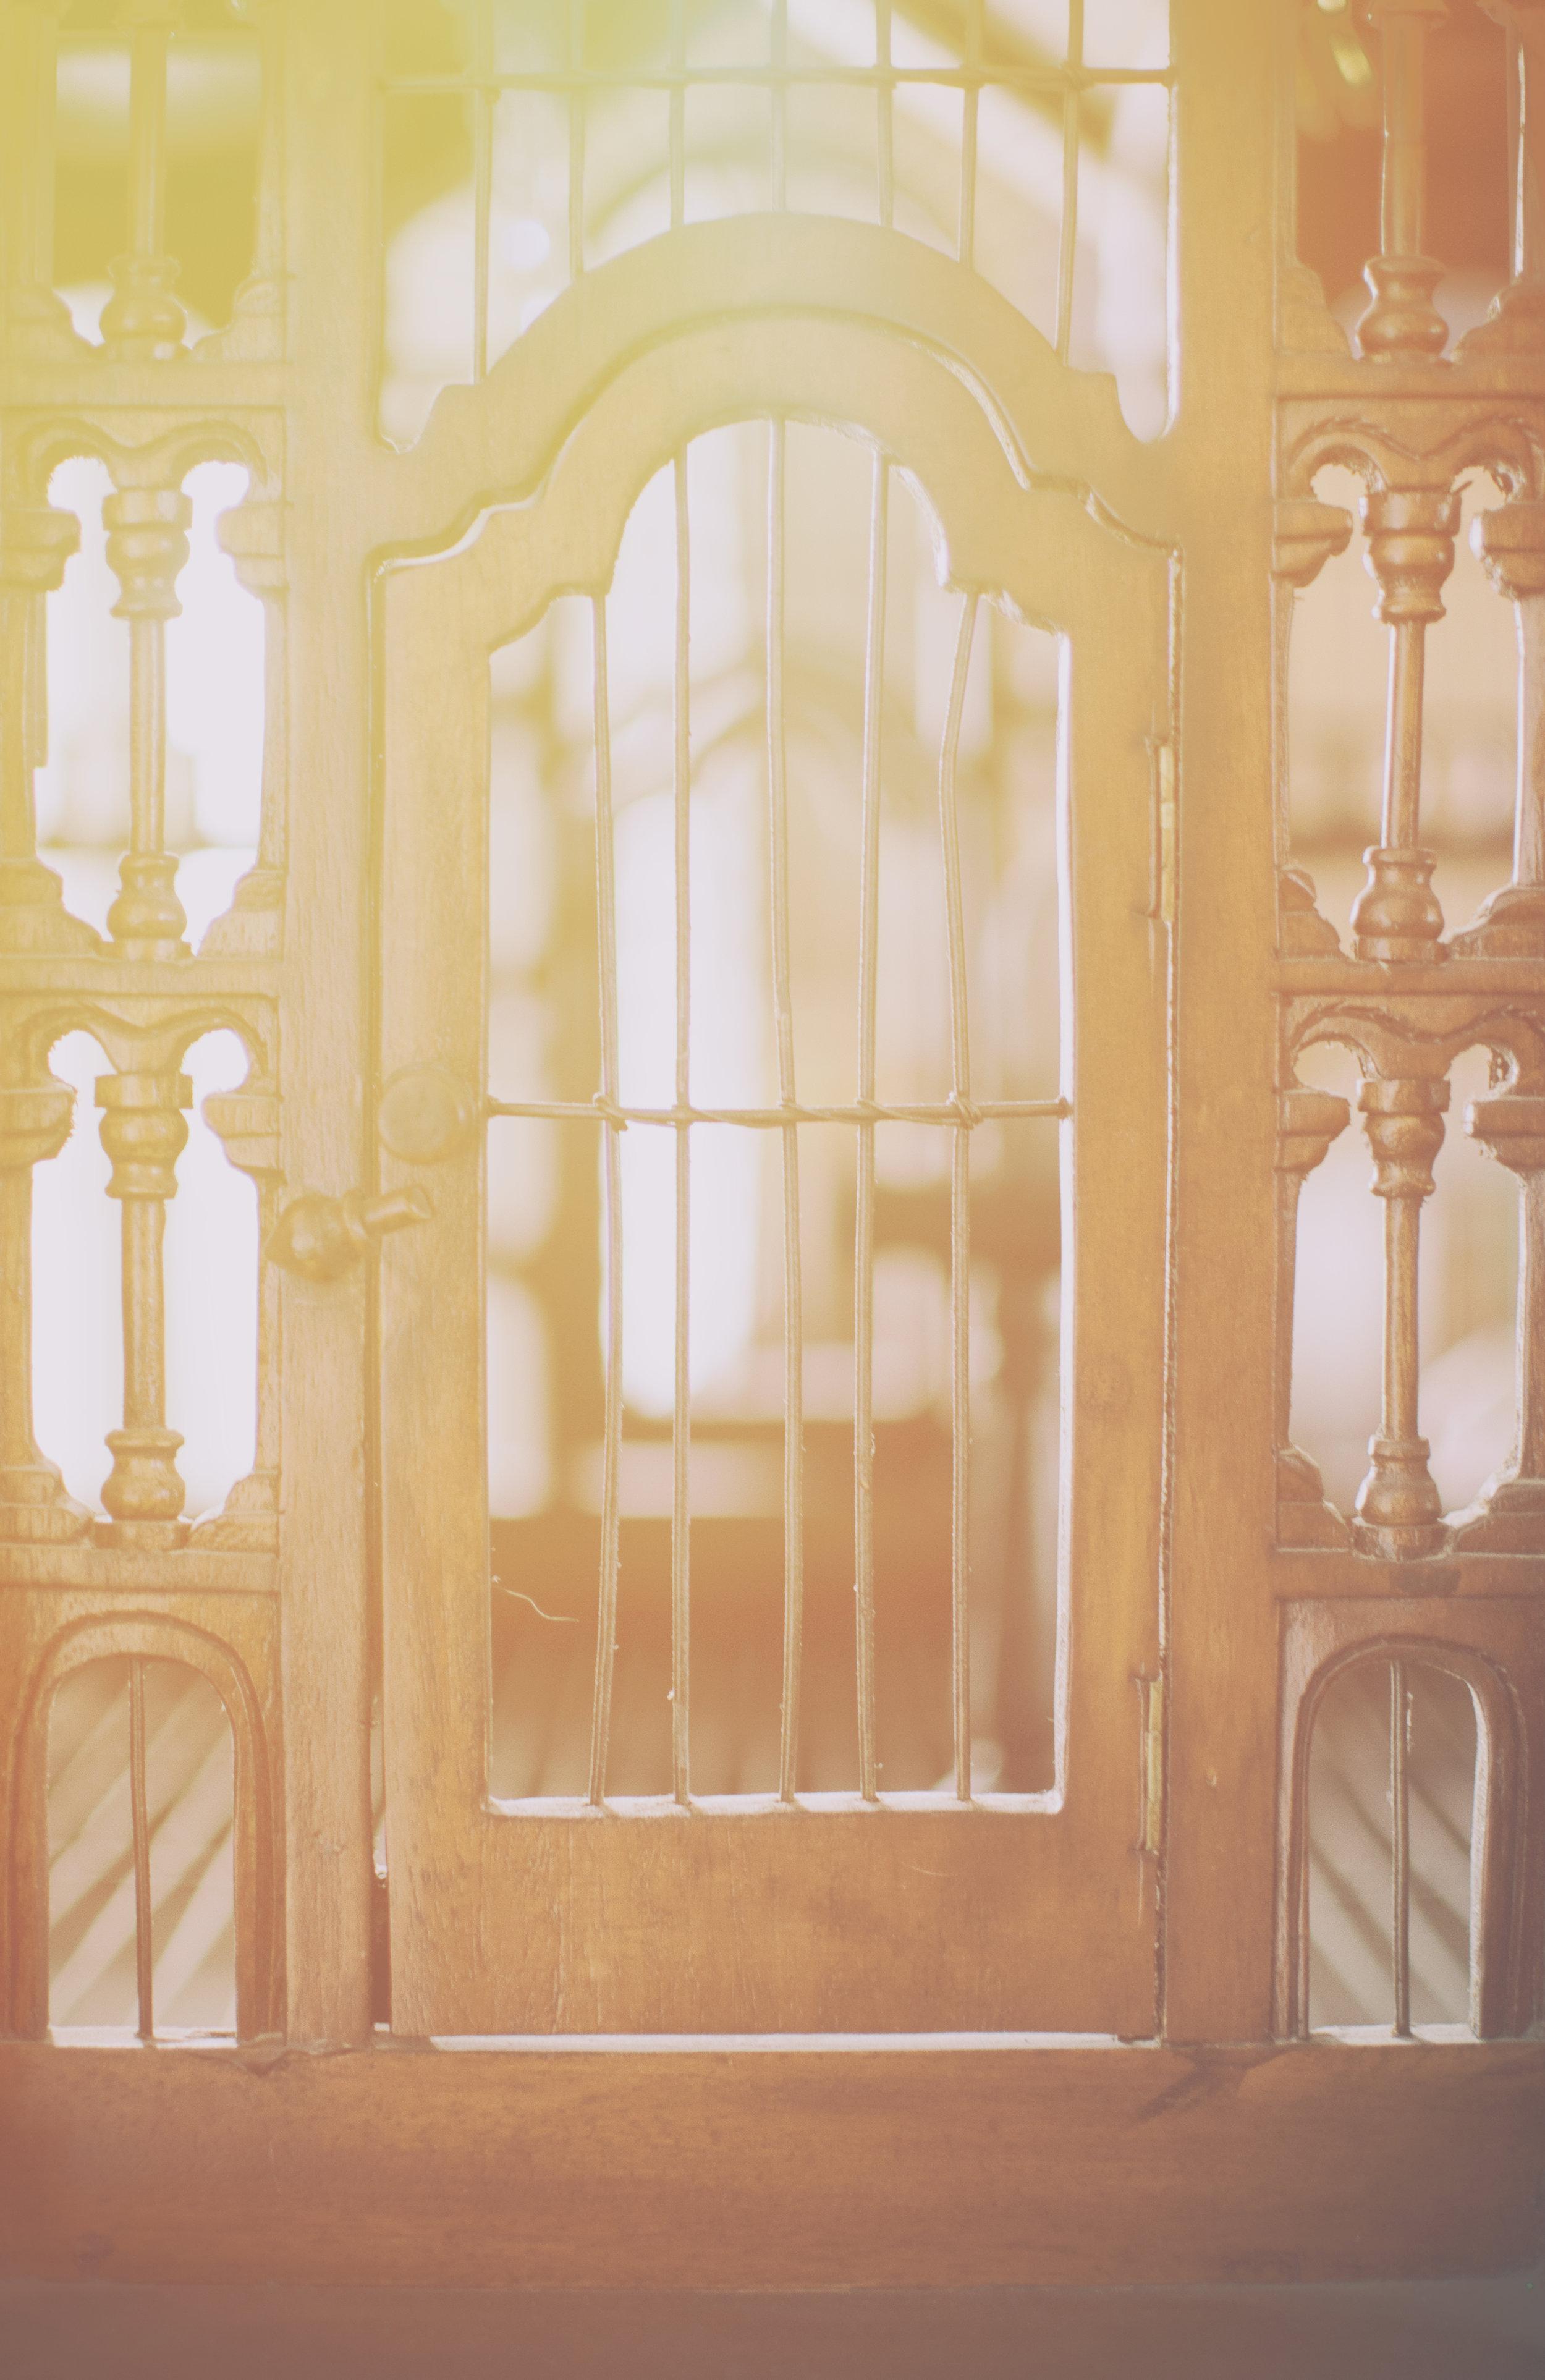 Urban_cage003.jpg